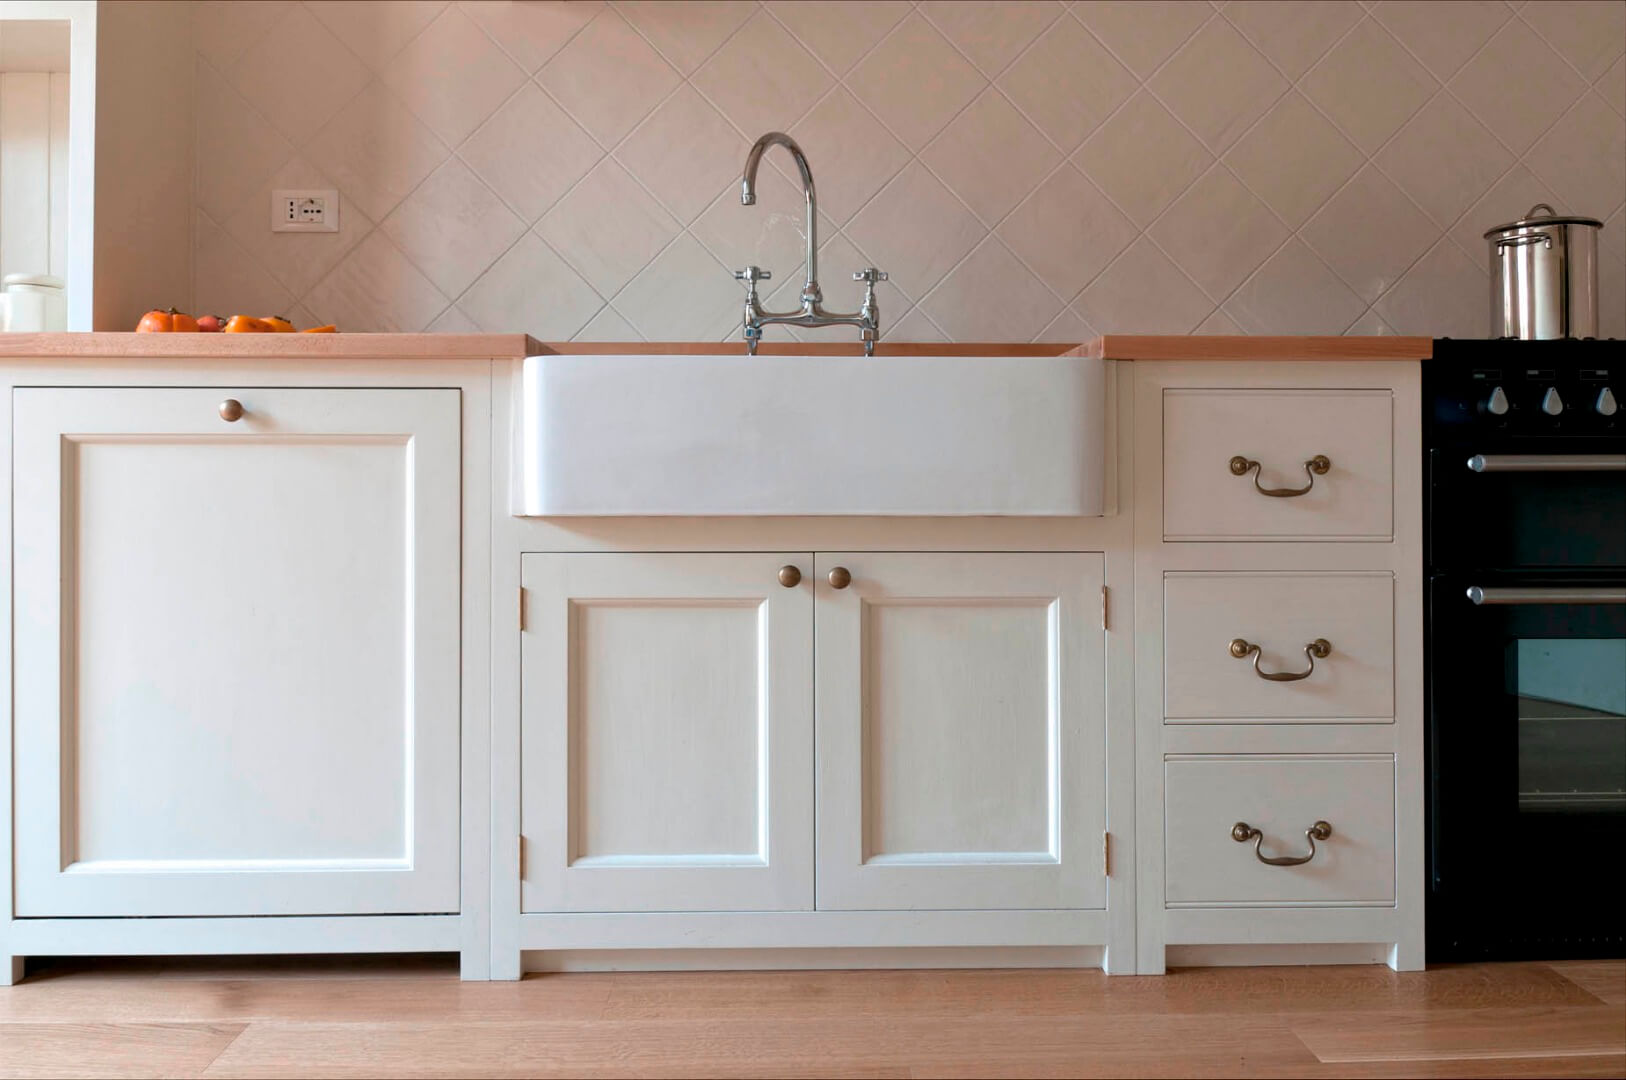 Lampadario cucina vetro bianco - Cucine all americana foto ...